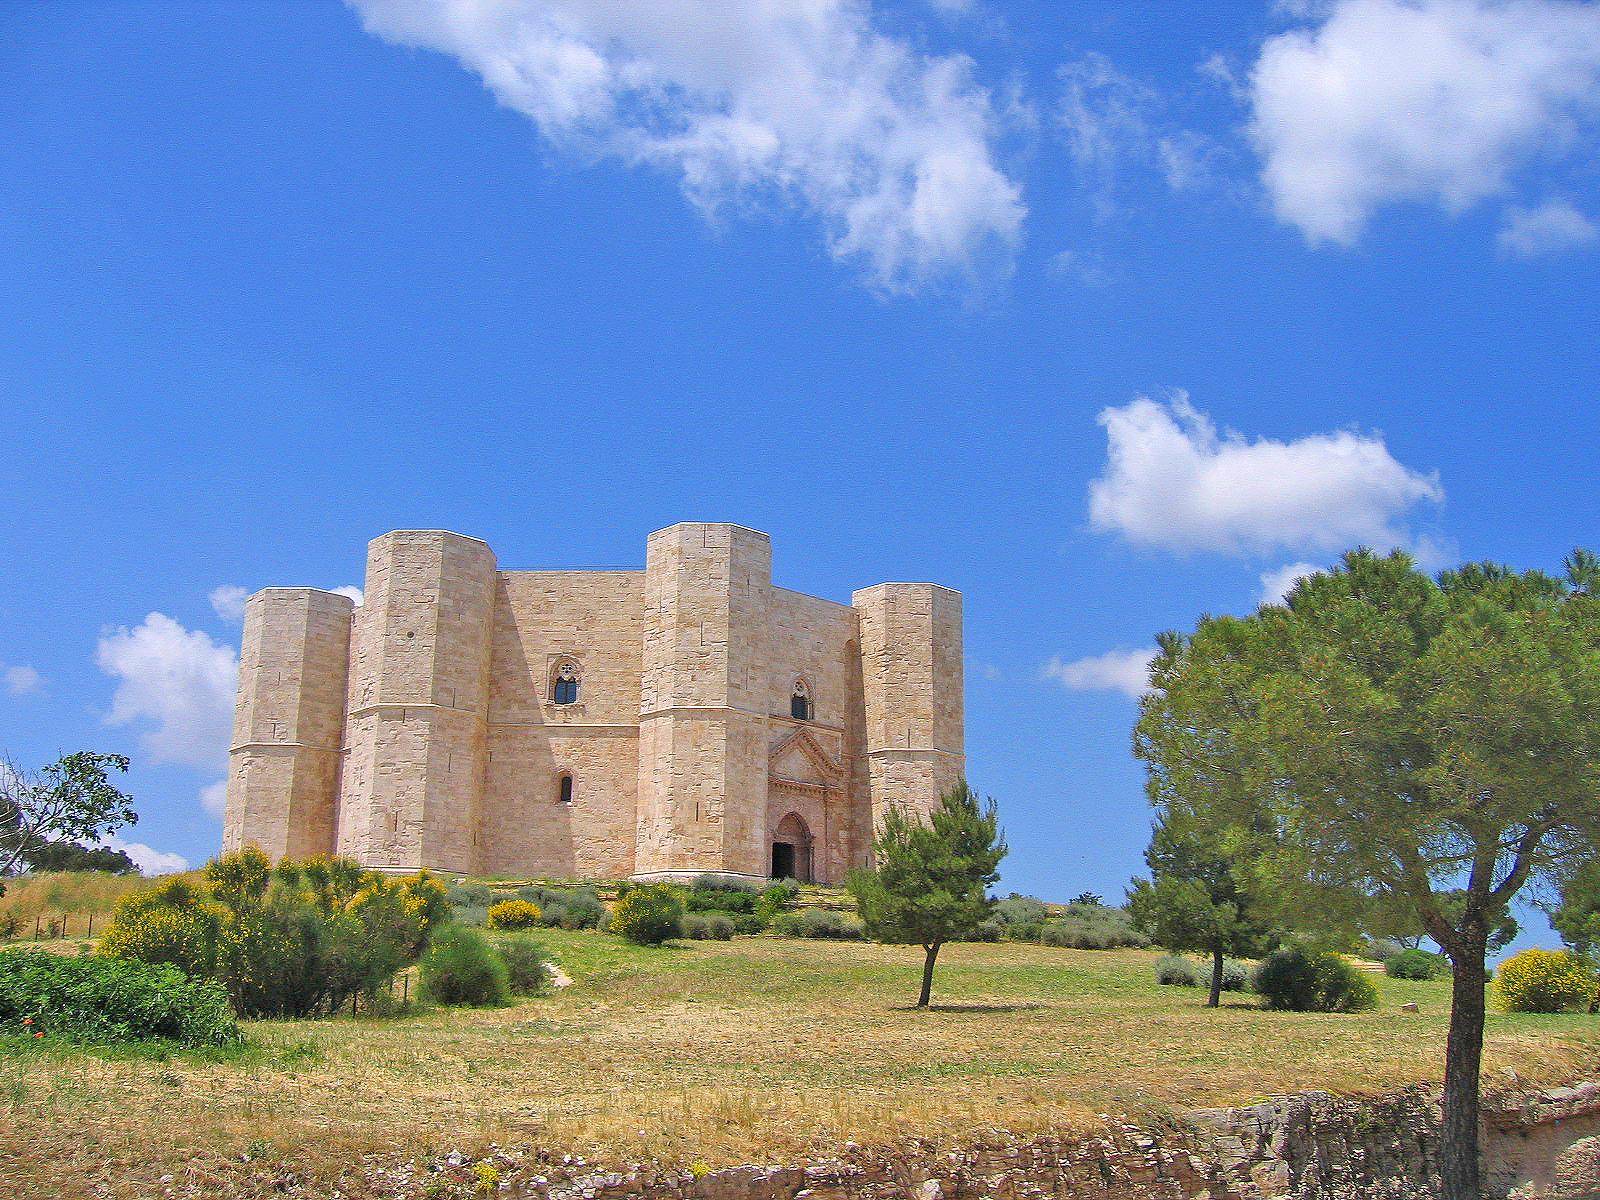 castel del monte - photo #50